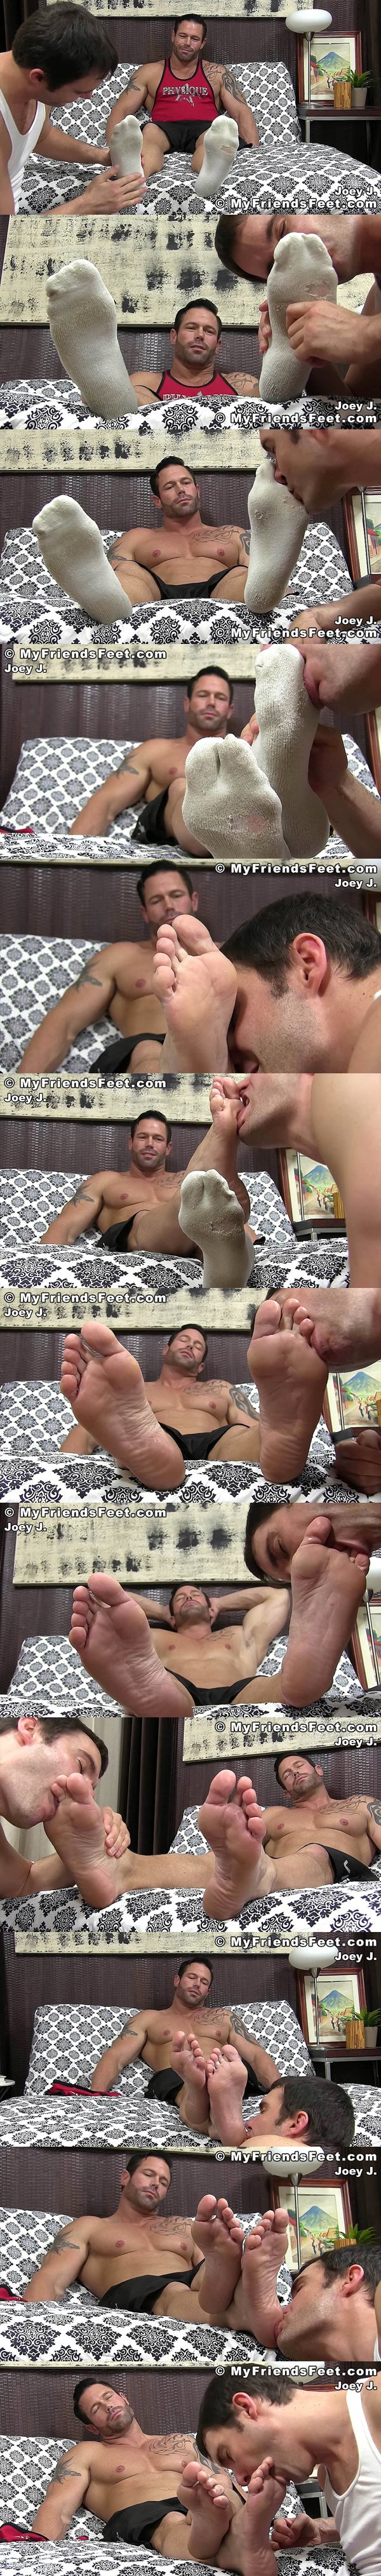 Myfriendsfeet - Joey Size 12 Feet Worshiped 02